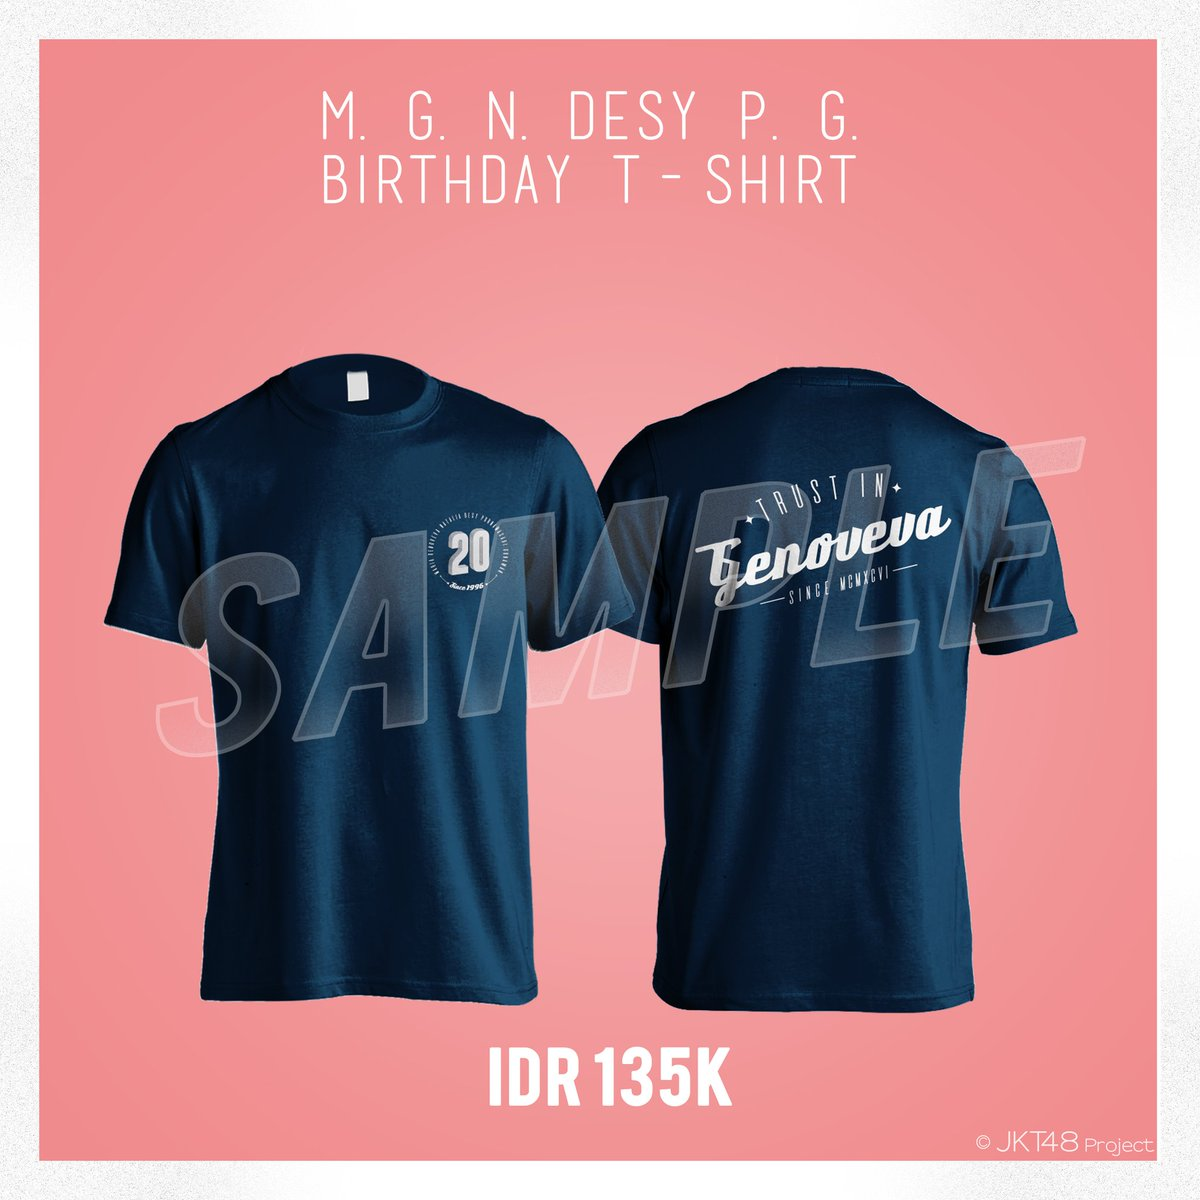 Desain t shirt jkt48 - 24 Replies 130 Retweets 274 Likes